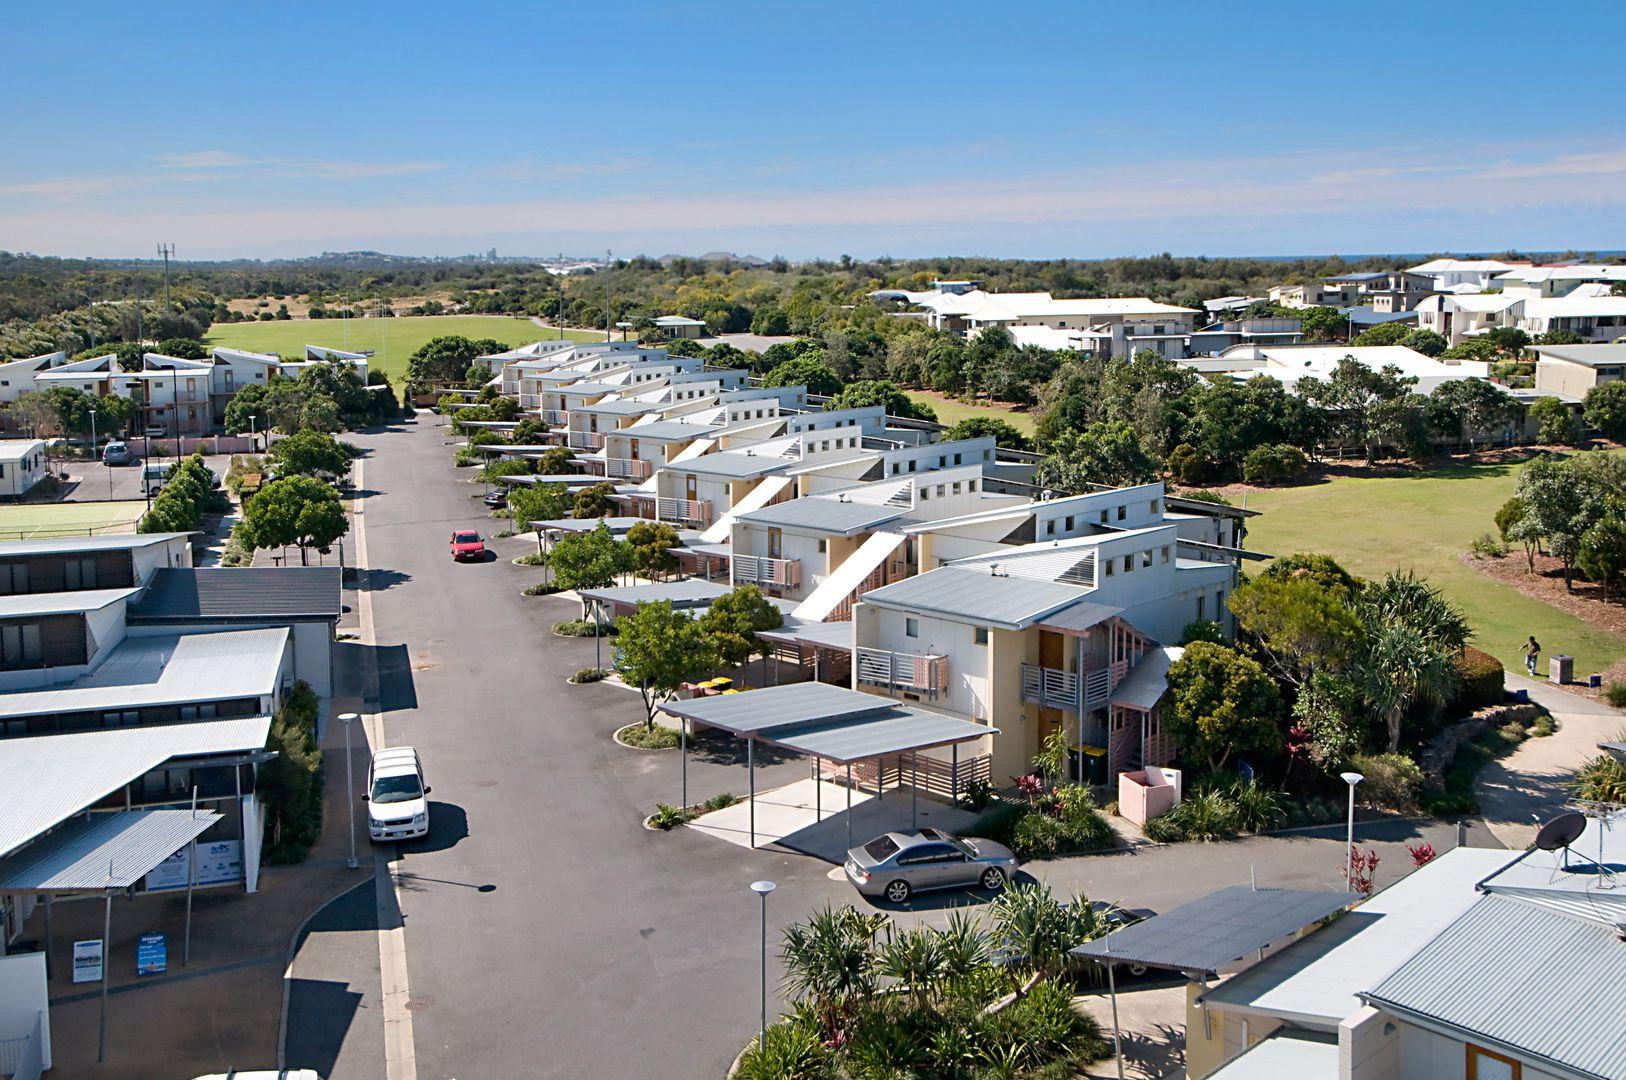 18/3 Cedarwood Court, Casuarina NSW 2487, Image 1